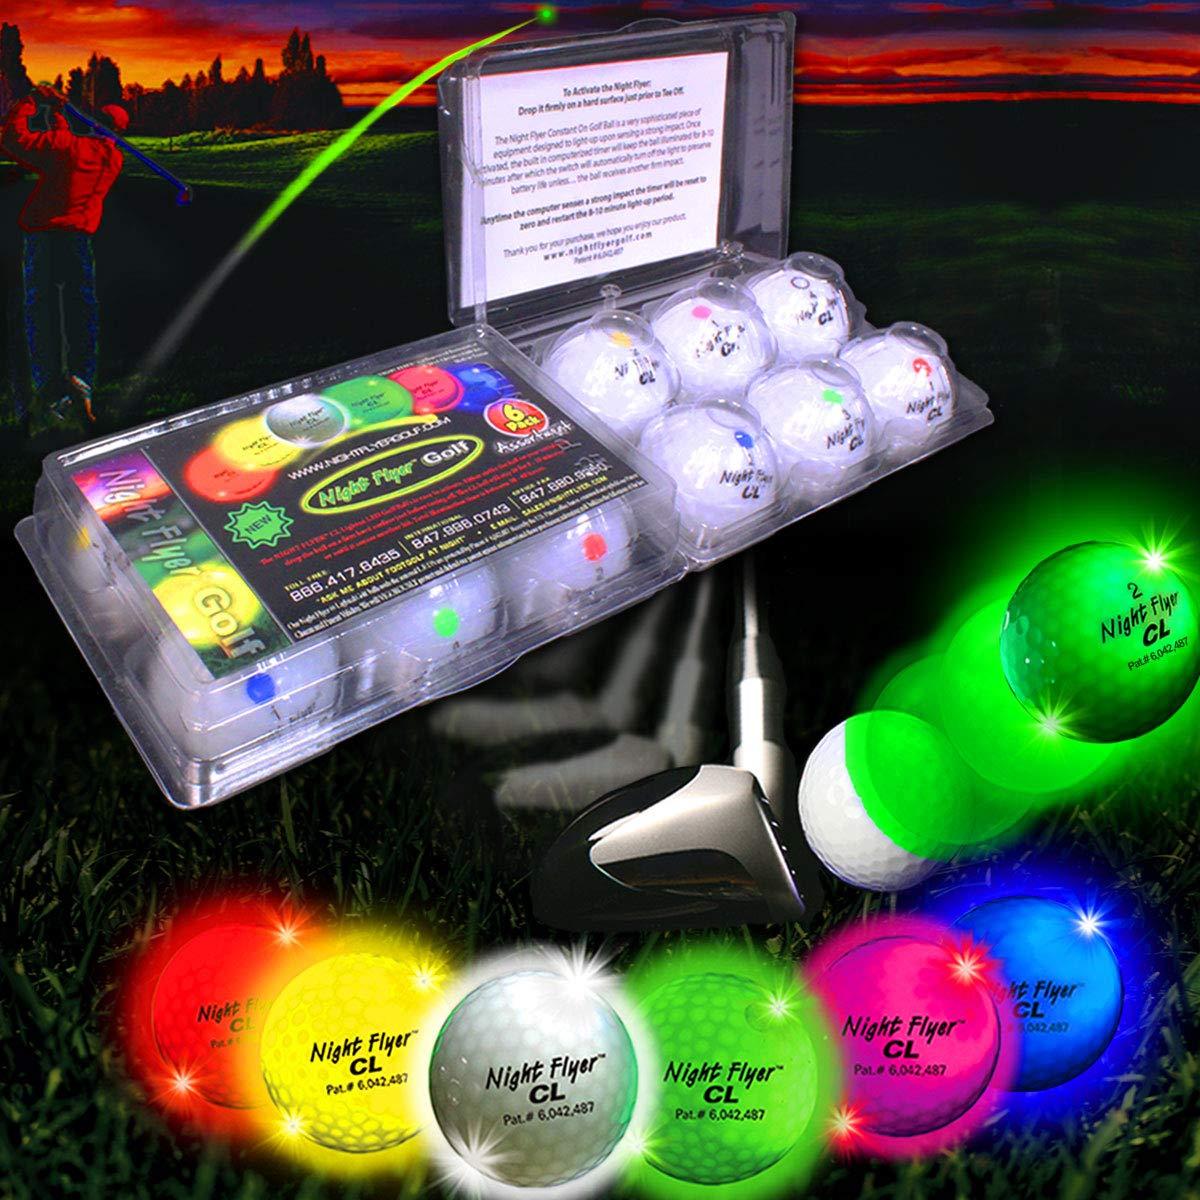 Night Flyer Lighted Golf Balls - 12 Ball Variety Pack by Night Flyer